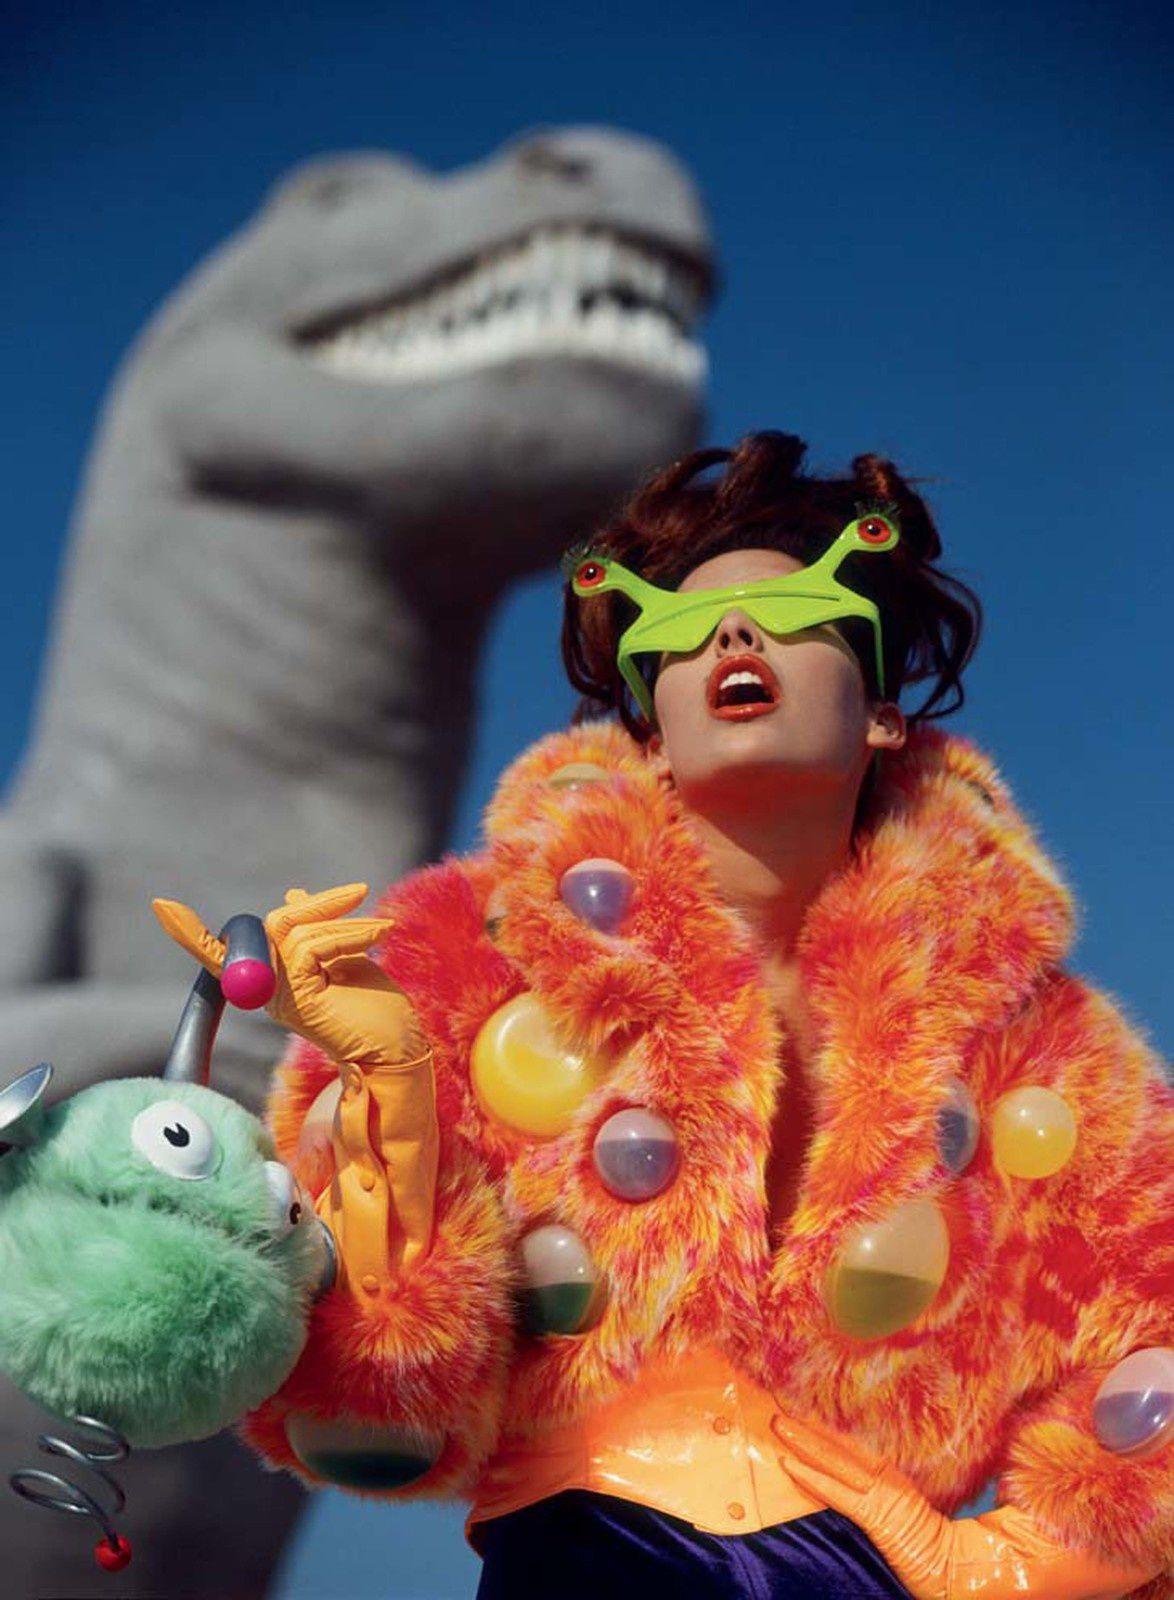 """Dinosaures de Cabazon, Californie, États-Unis"", 1991 de Manfred Thierry MUGLER - Courtesy de l'artiste et Polka Gallery"